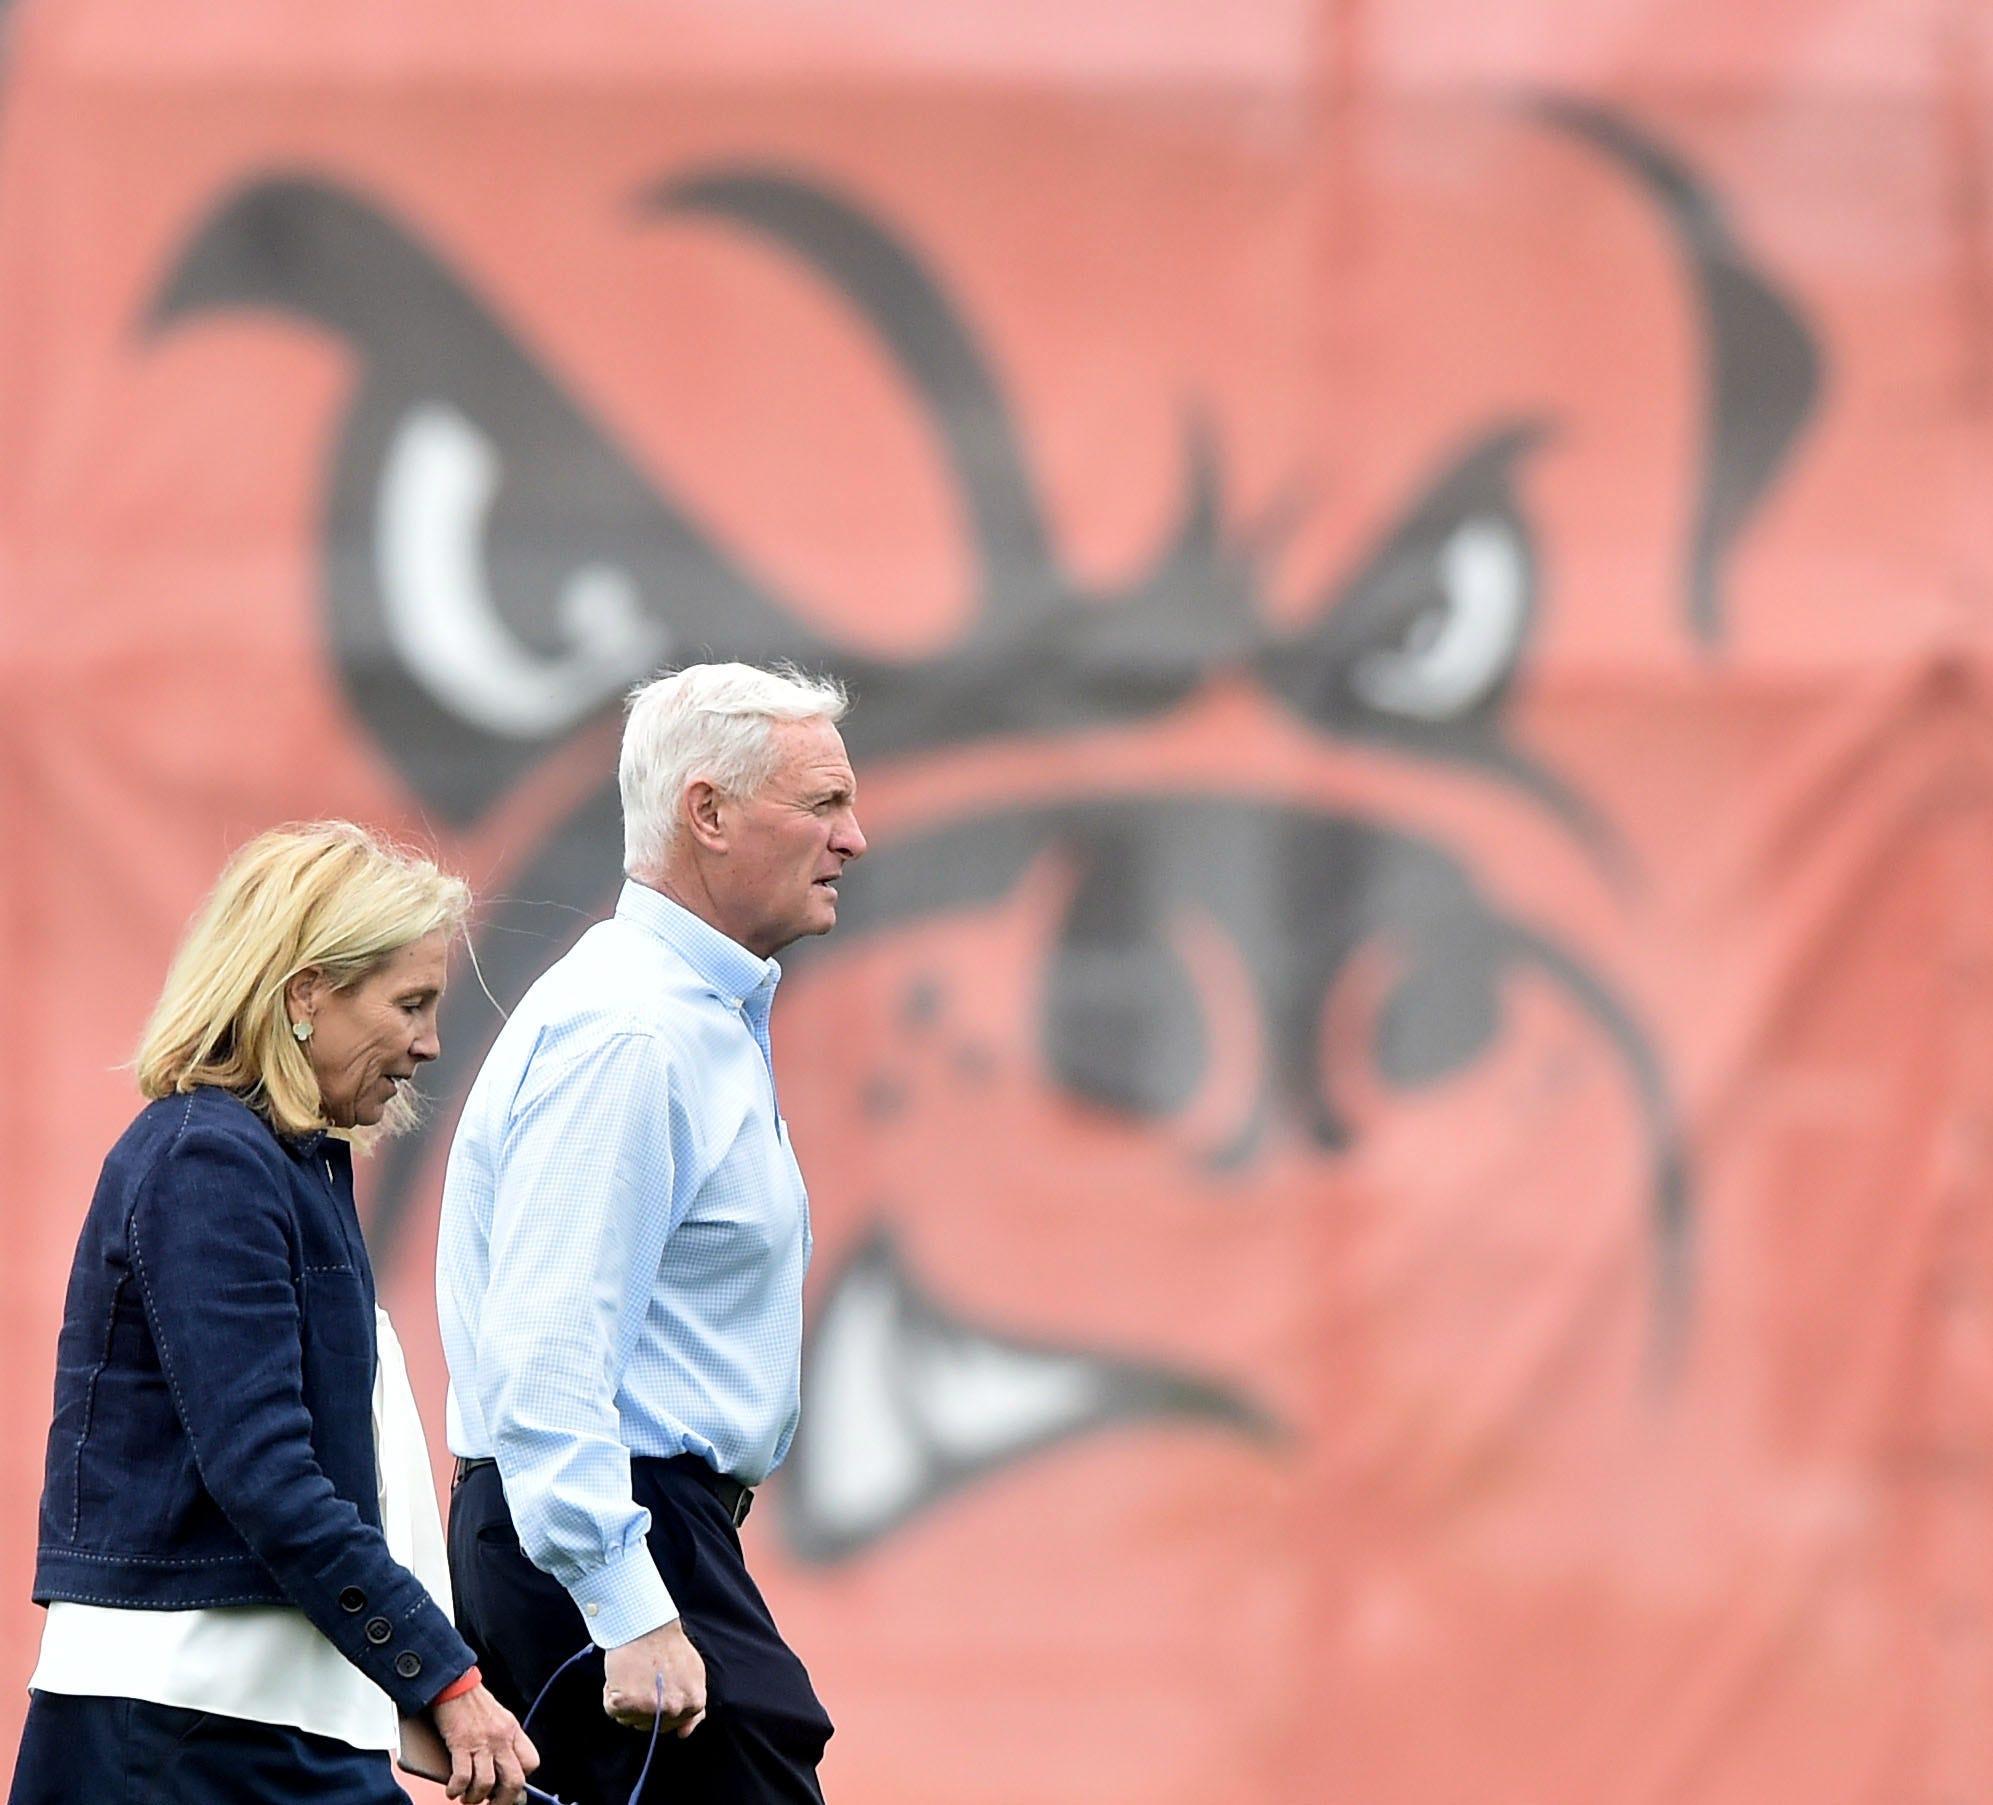 636324596799385176-USP-NFL-Cleveland-Browns-OTA Browns owner Jimmy Haslam 'feeling plenty of pressure' as Cavs, Indians excel